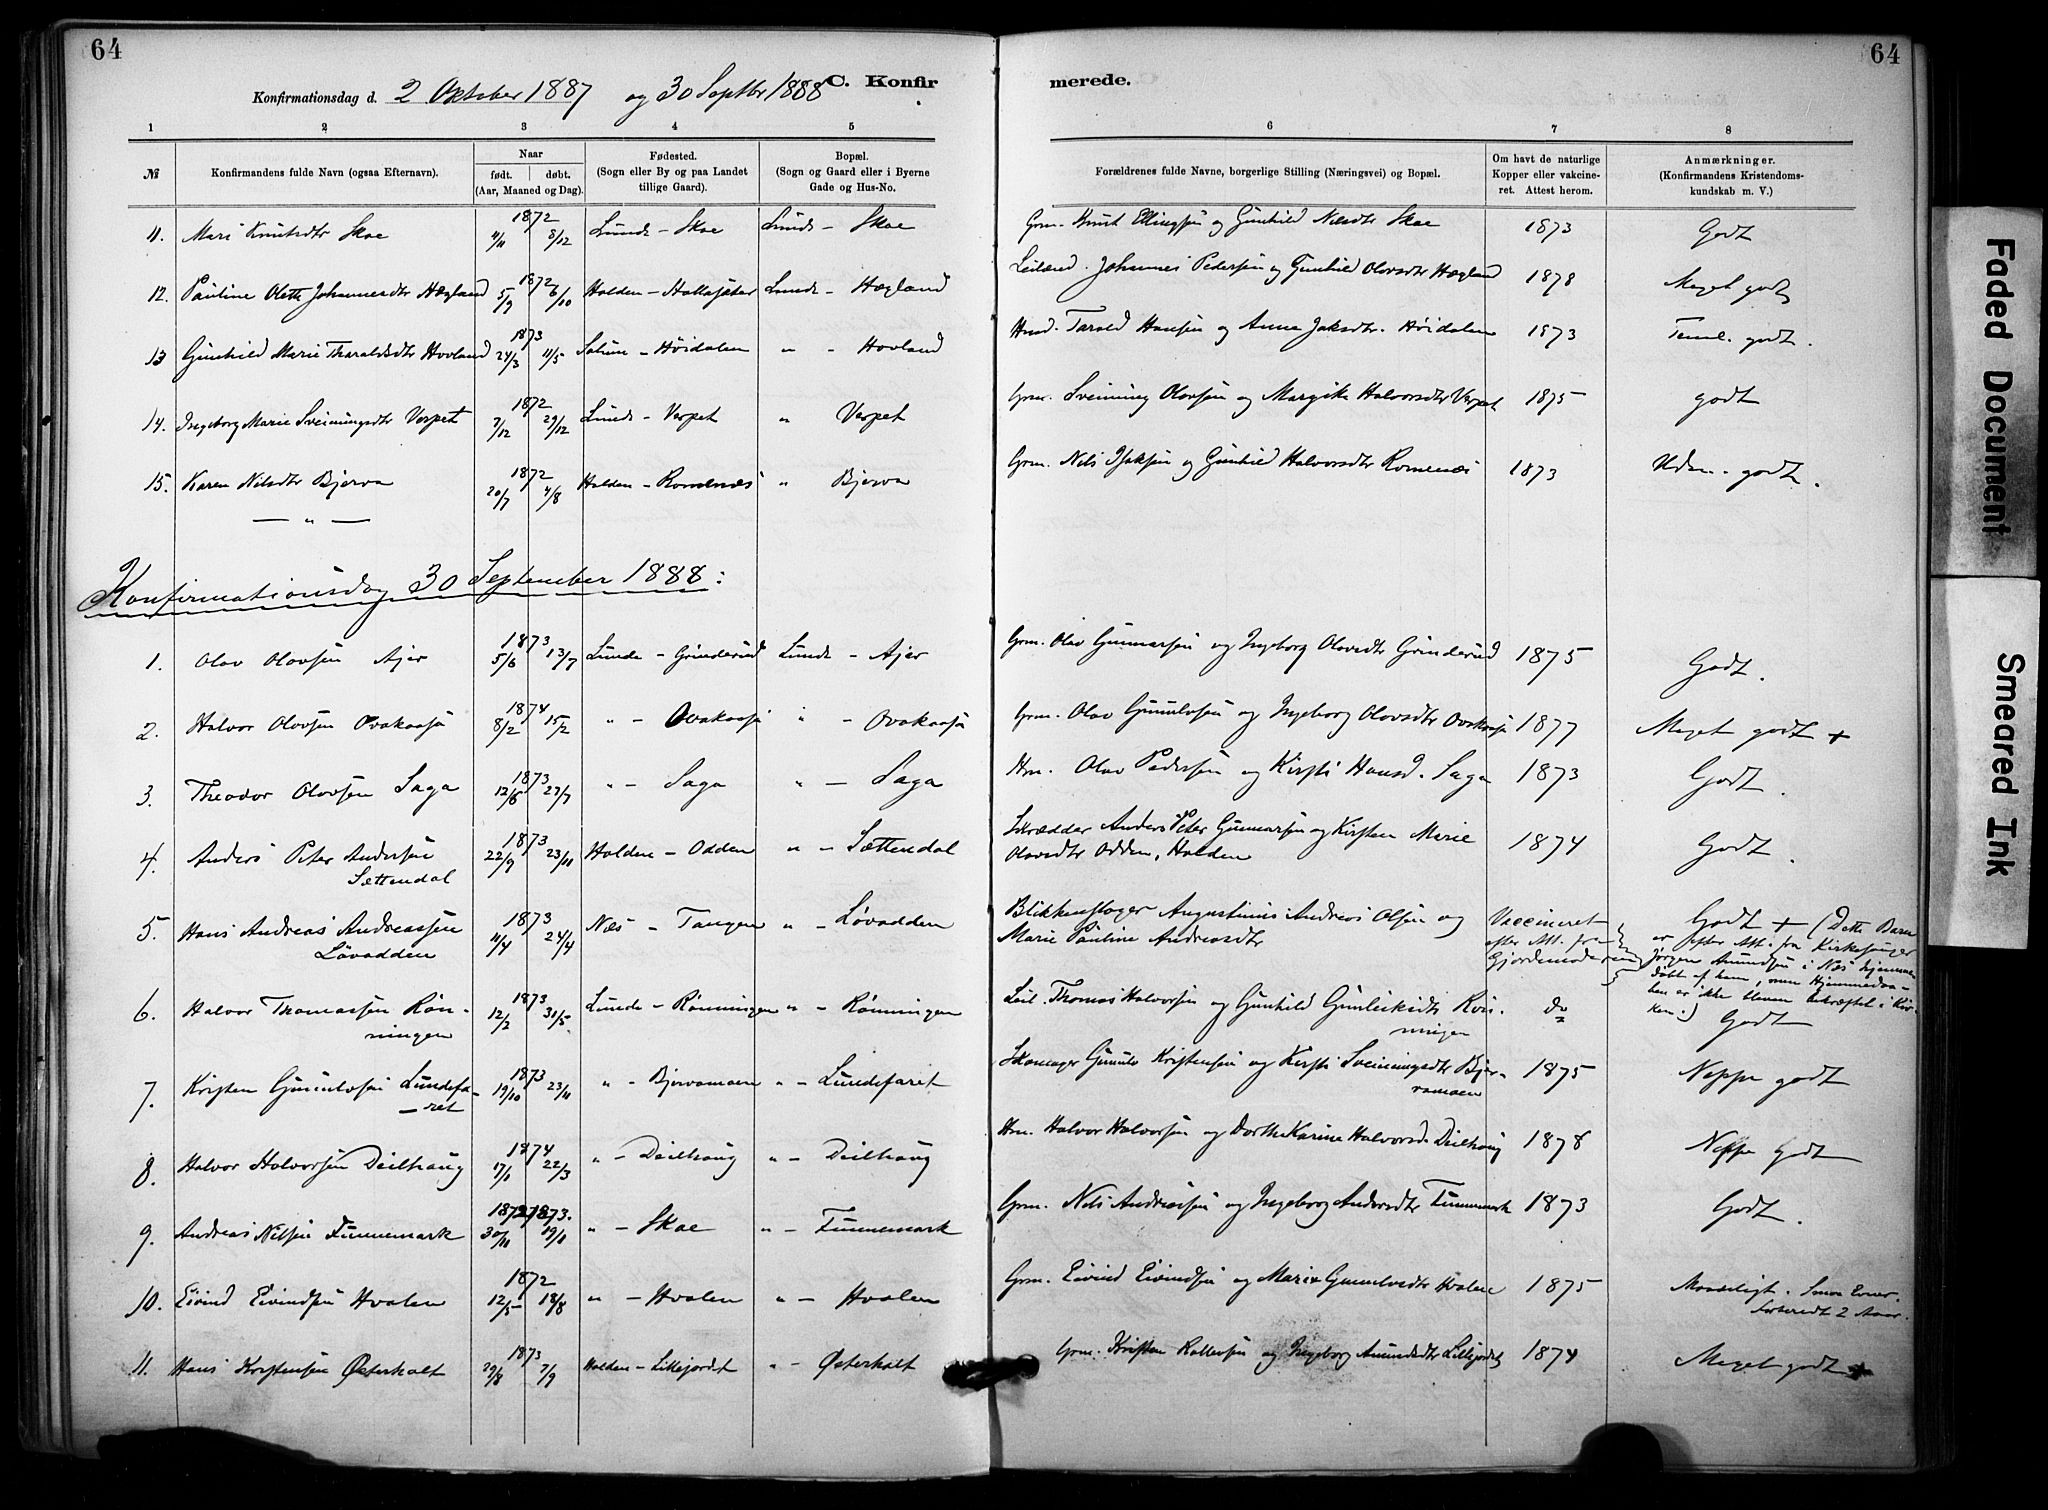 SAKO, Lunde kirkebøker, F/Fa/L0002: Ministerialbok nr. I 2, 1884-1892, s. 64